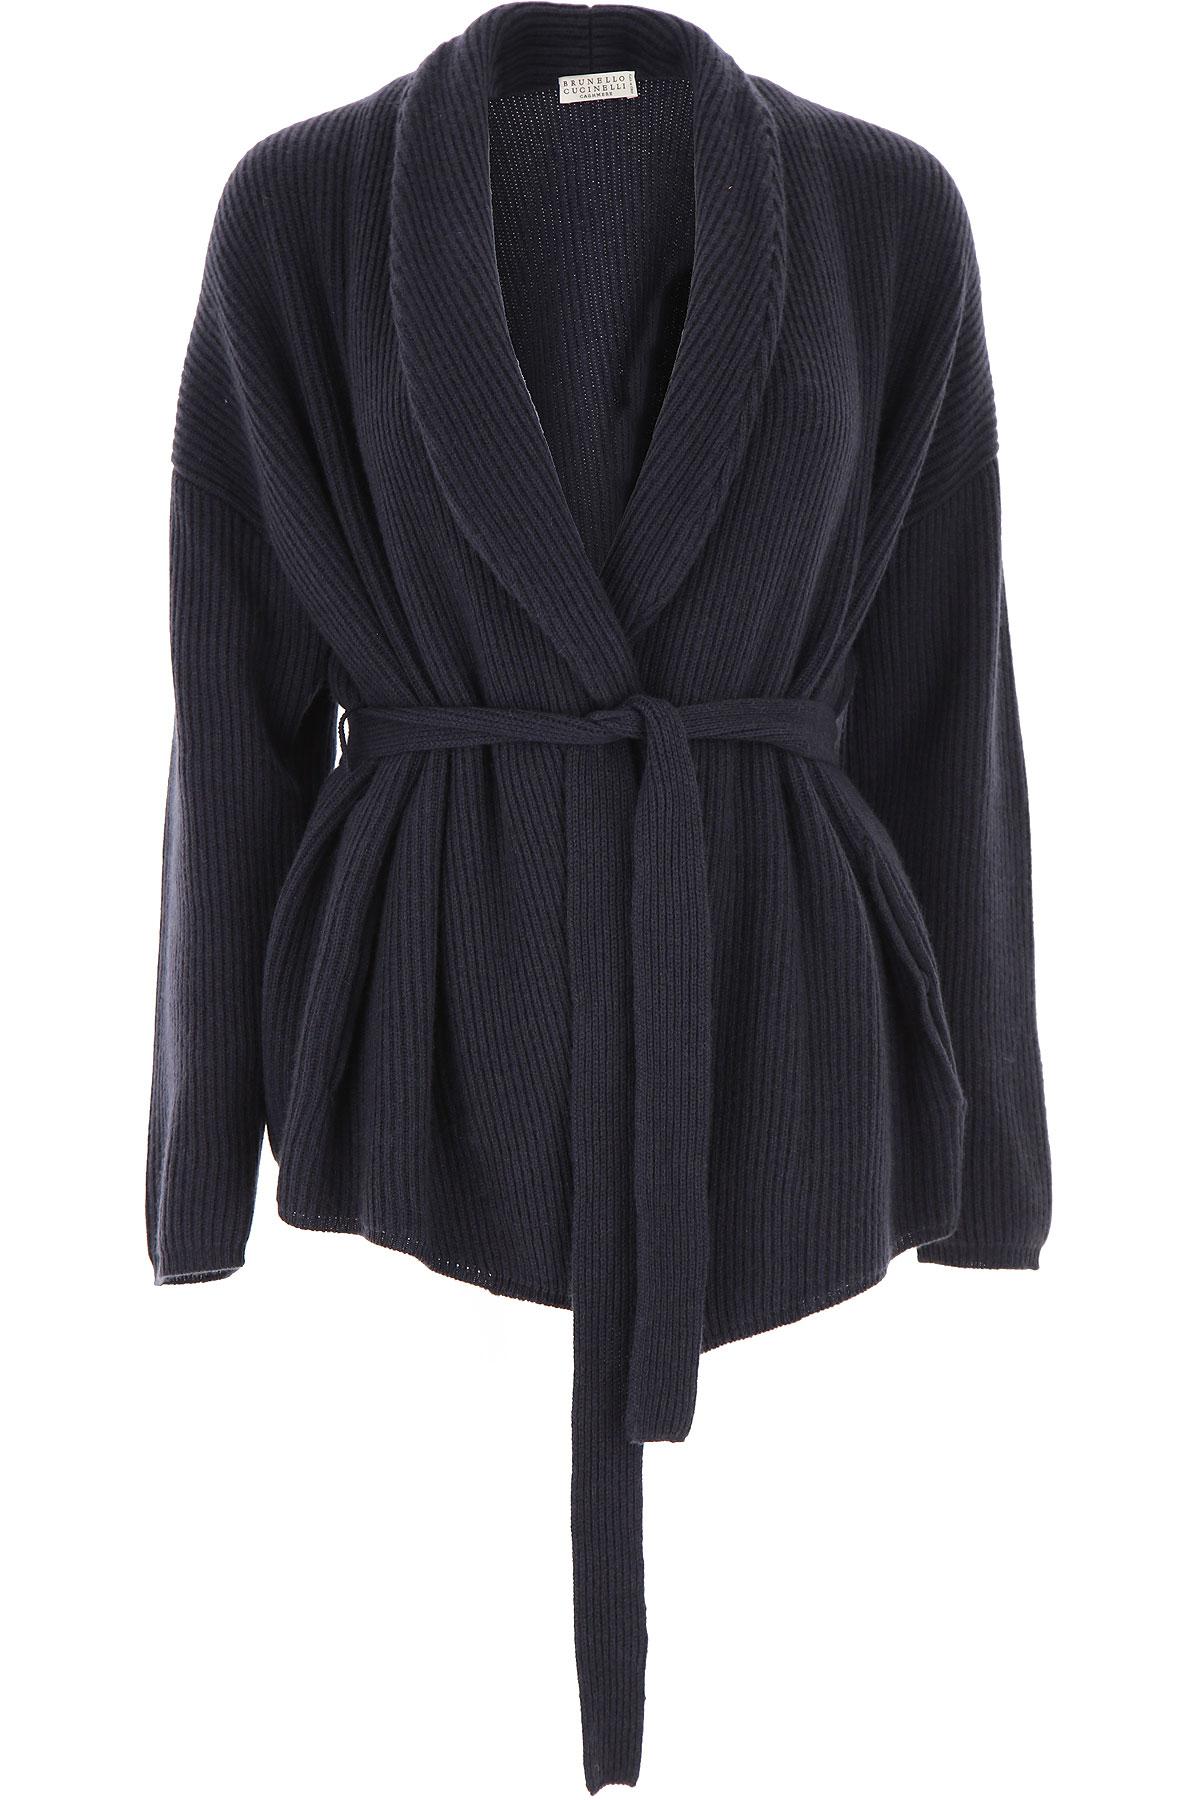 Brunello Cucinelli Sweater for Women Jumper On Sale, Blue, Cashmere, 2019, 2 4 6